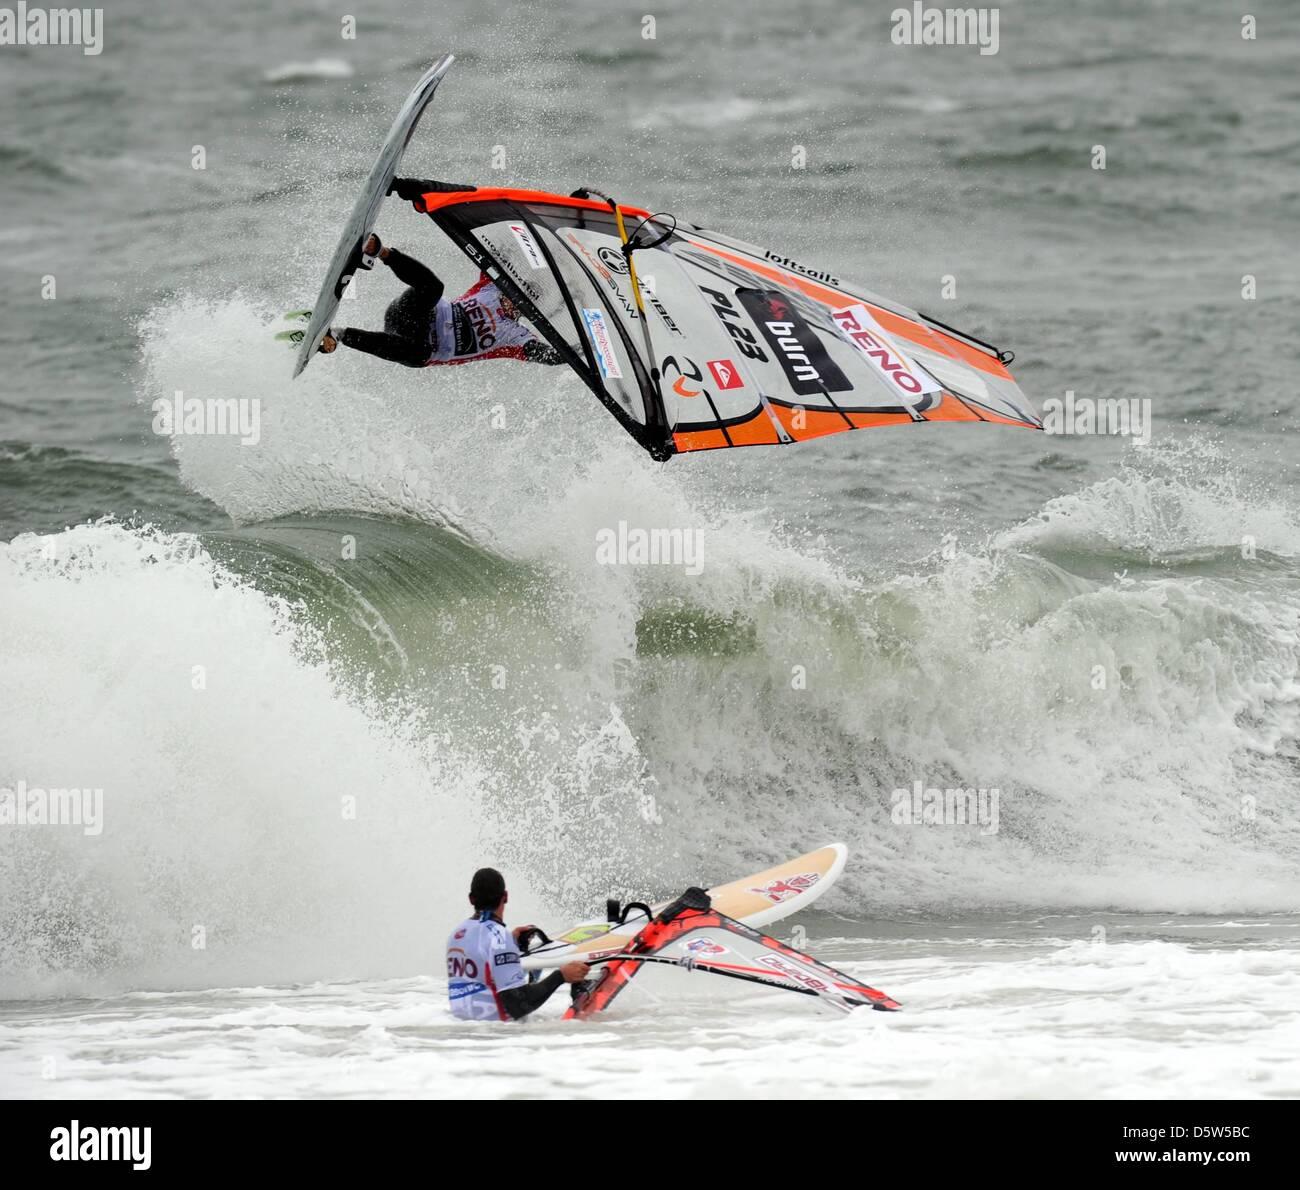 Polish windsurfer Maciek Rutkowski (above) surfs on North